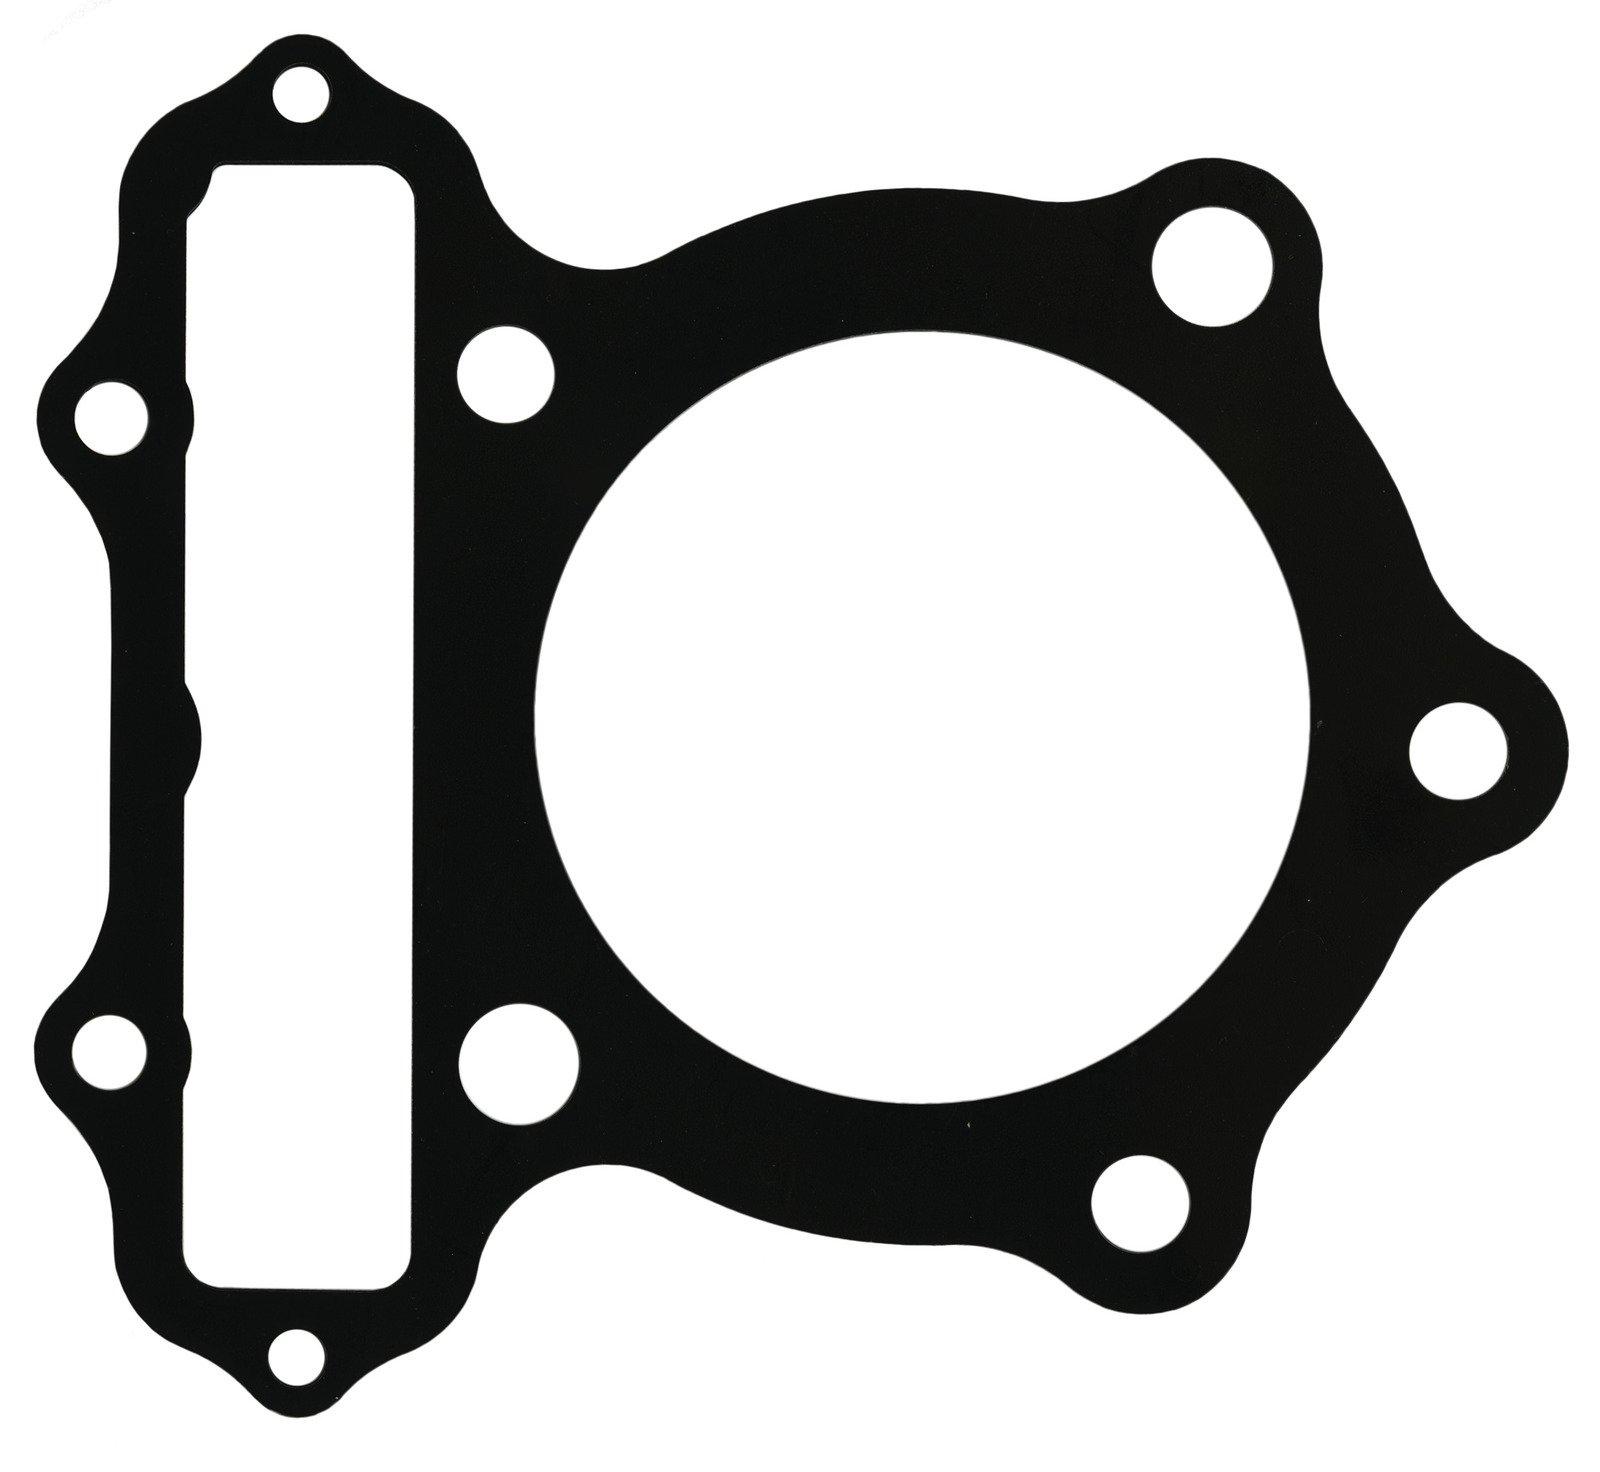 BigBore Reinforced Cylinder Head Gasket for Yamaha TT500 SR500 XT500 3.56  Multi Metal Layer 1-003